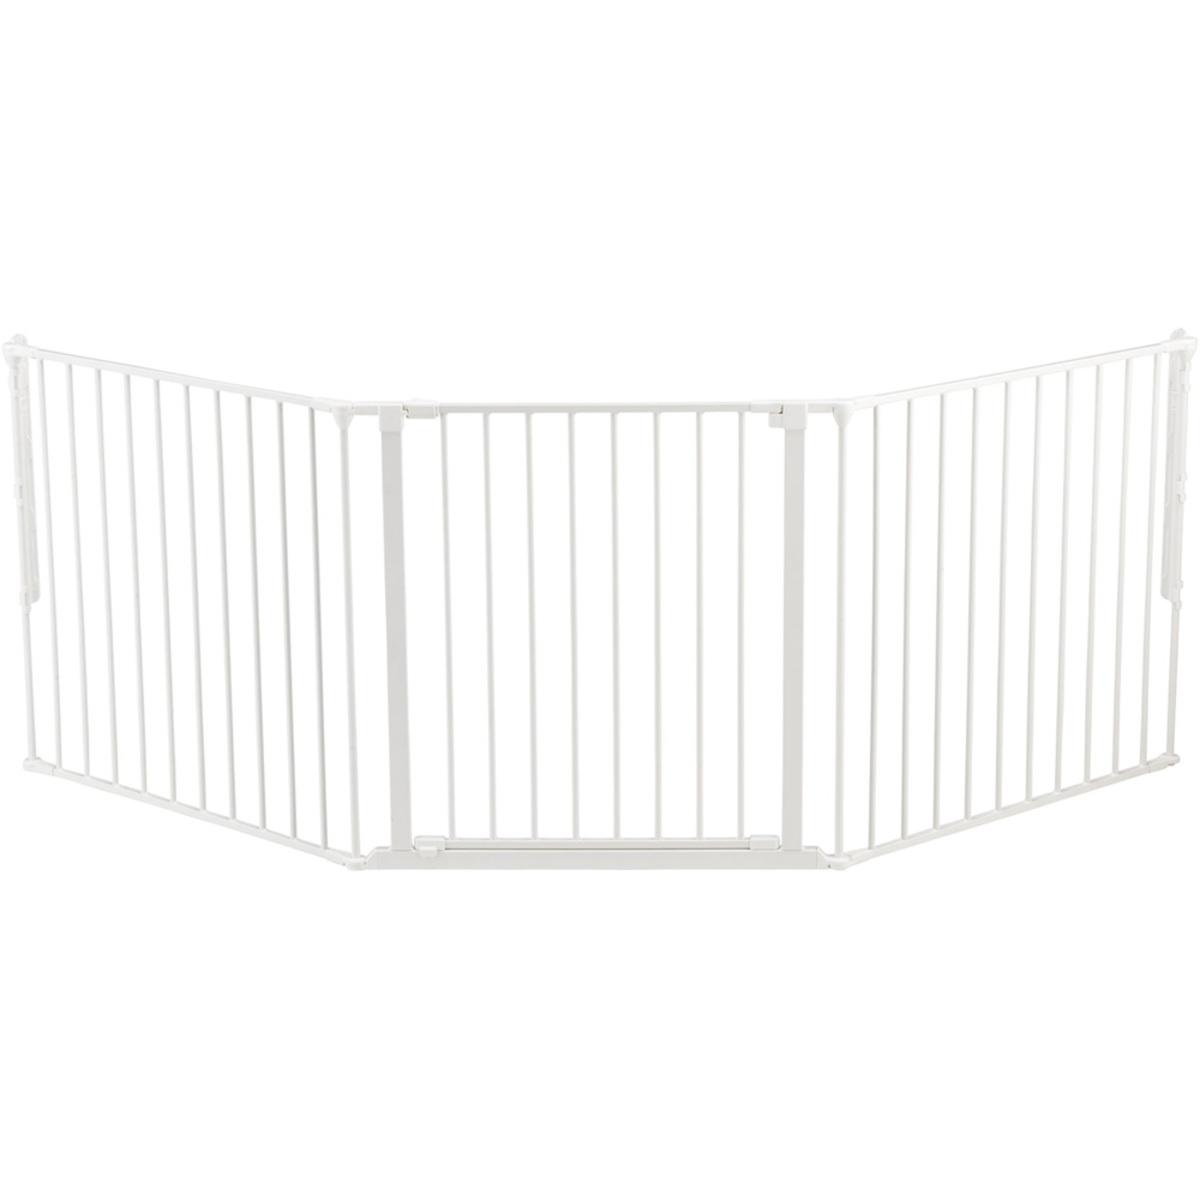 Barrière de sécurité Barrière de Sécurité Configure Taille L - Blanc Barrière de Sécurité Configure Taille L - Blanc